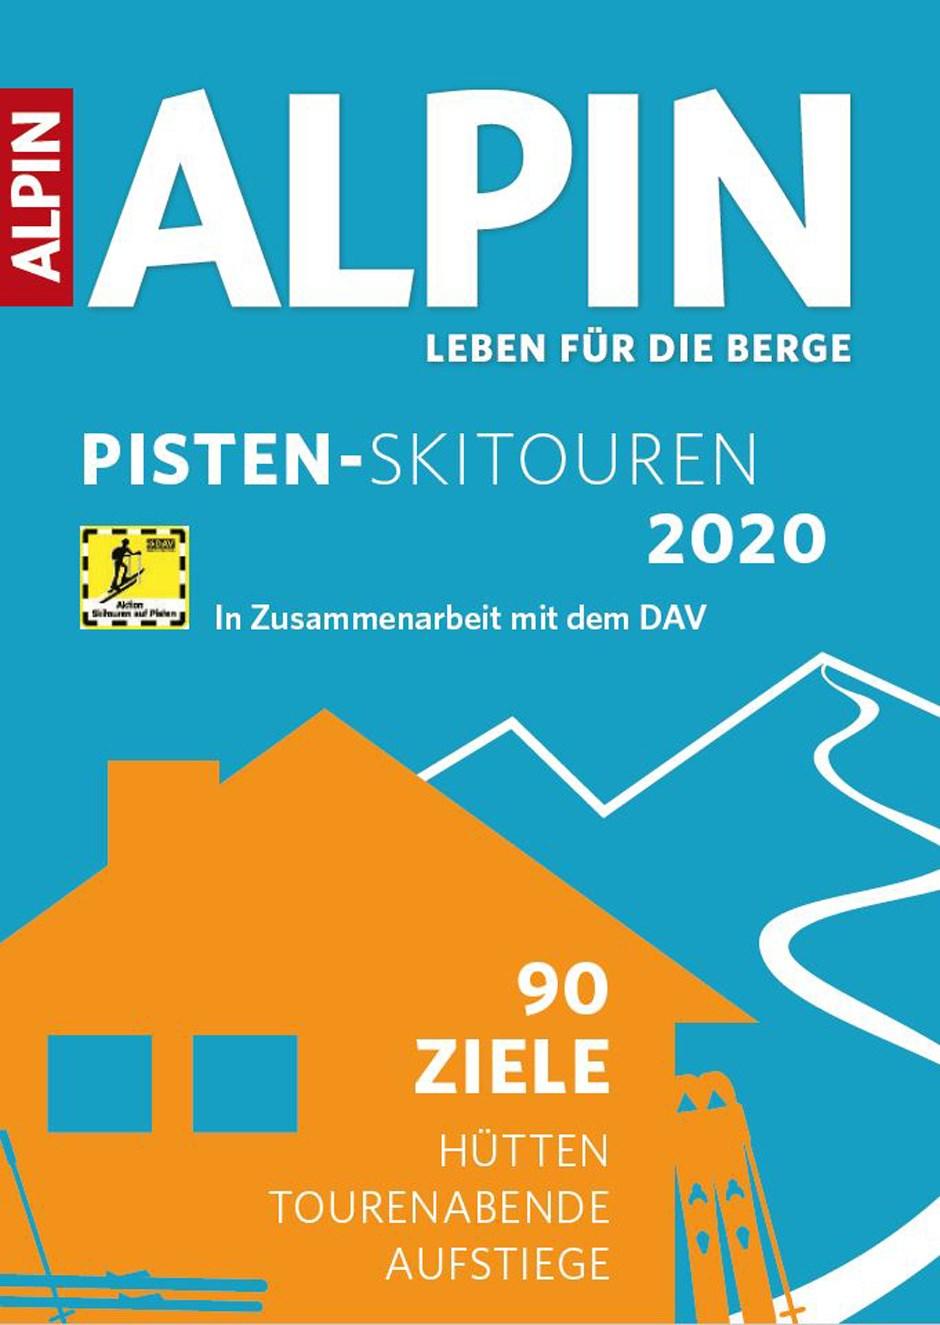 Booklet: Pisten-Skitouren